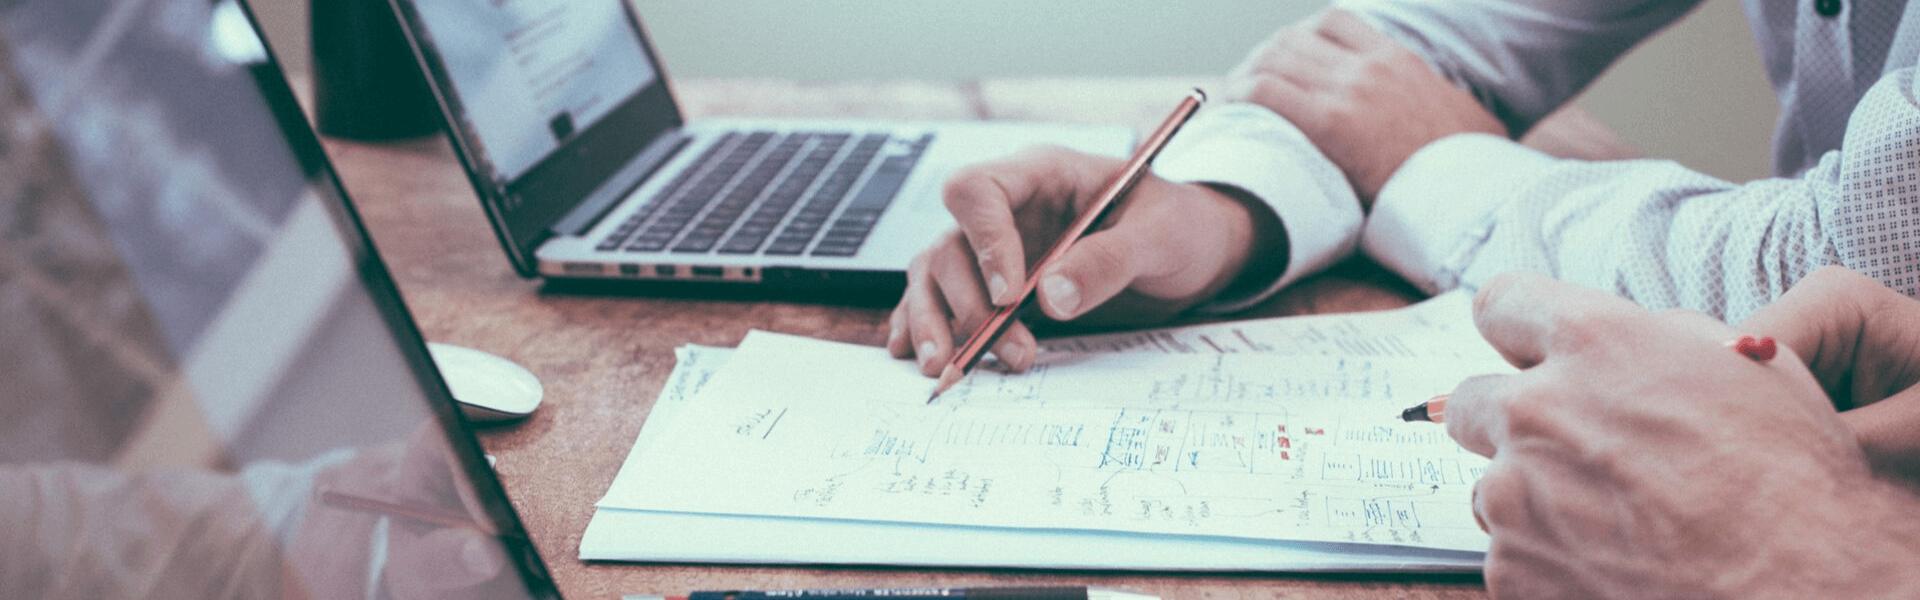 Projektanfrage KMU Beratung